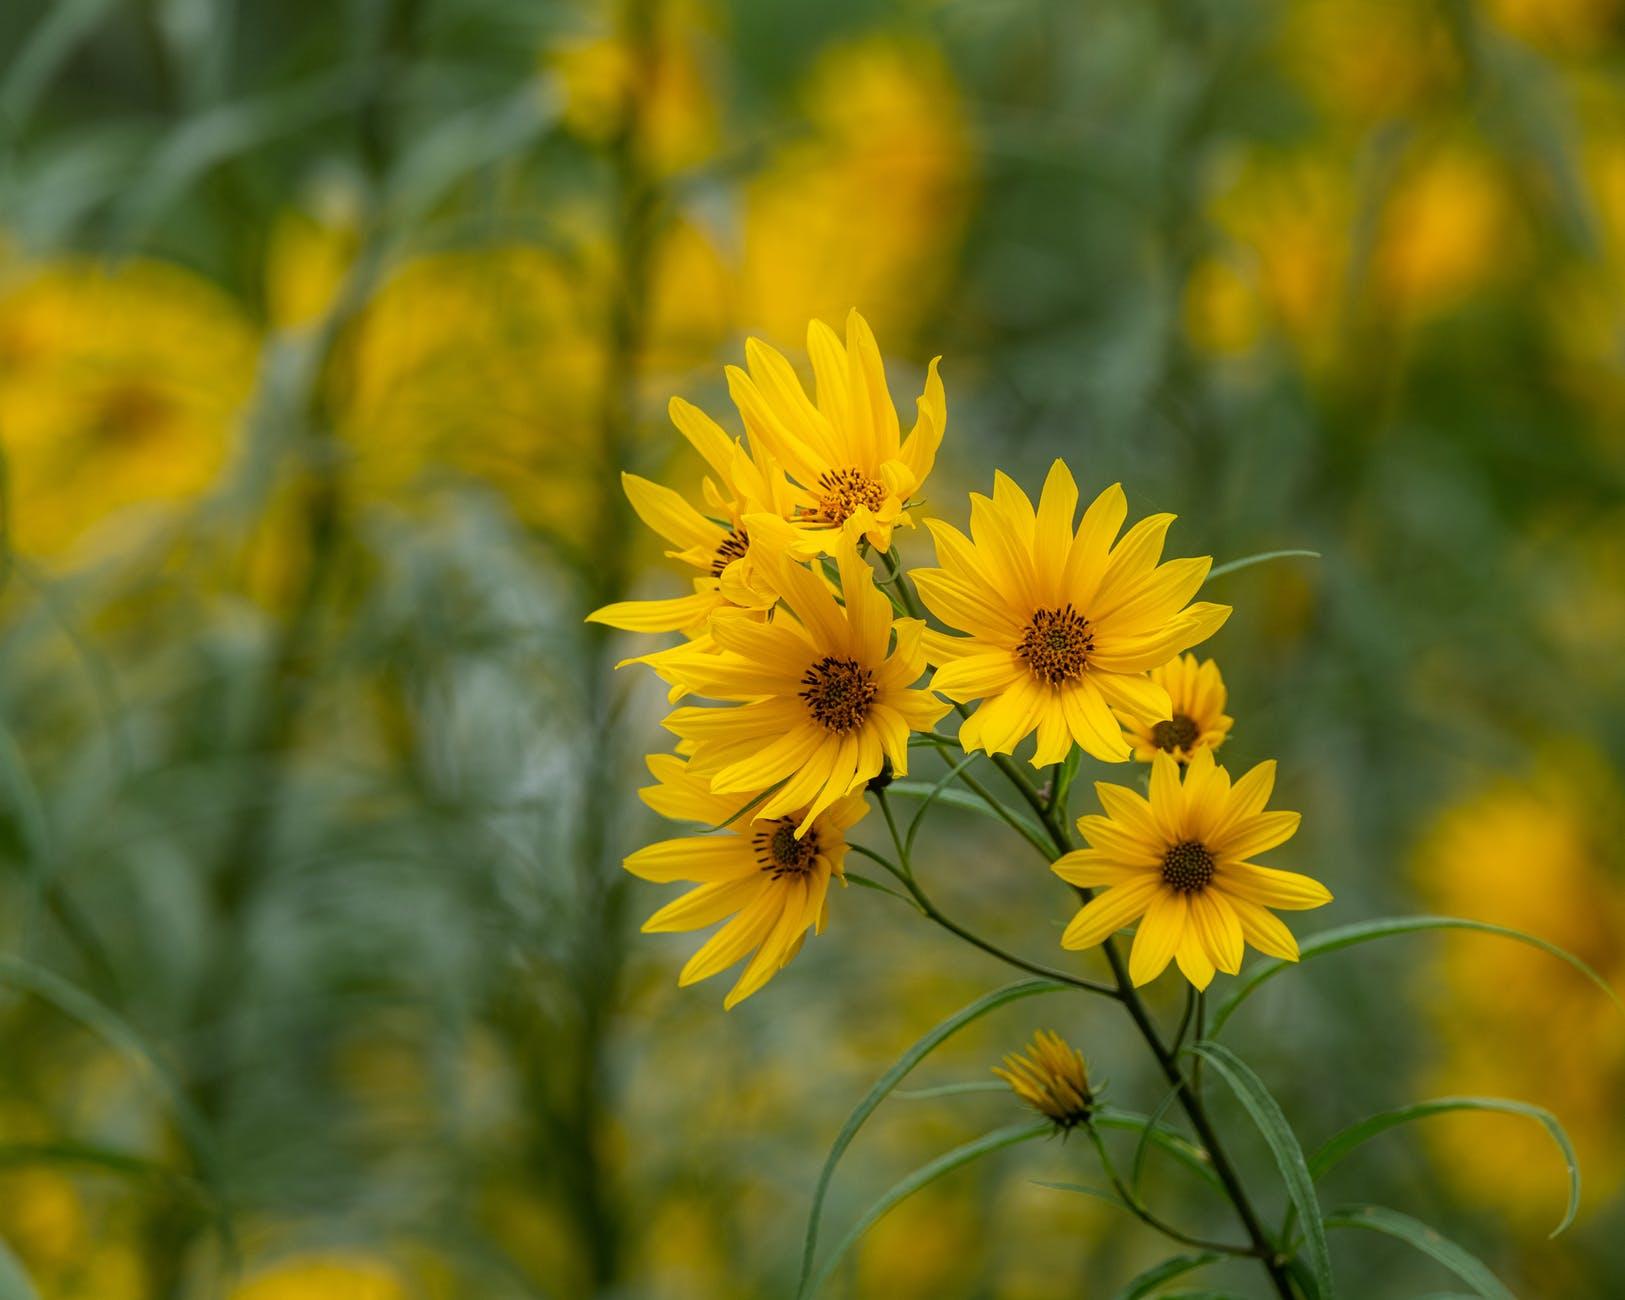 blooming yellow topinambur flowers in nature